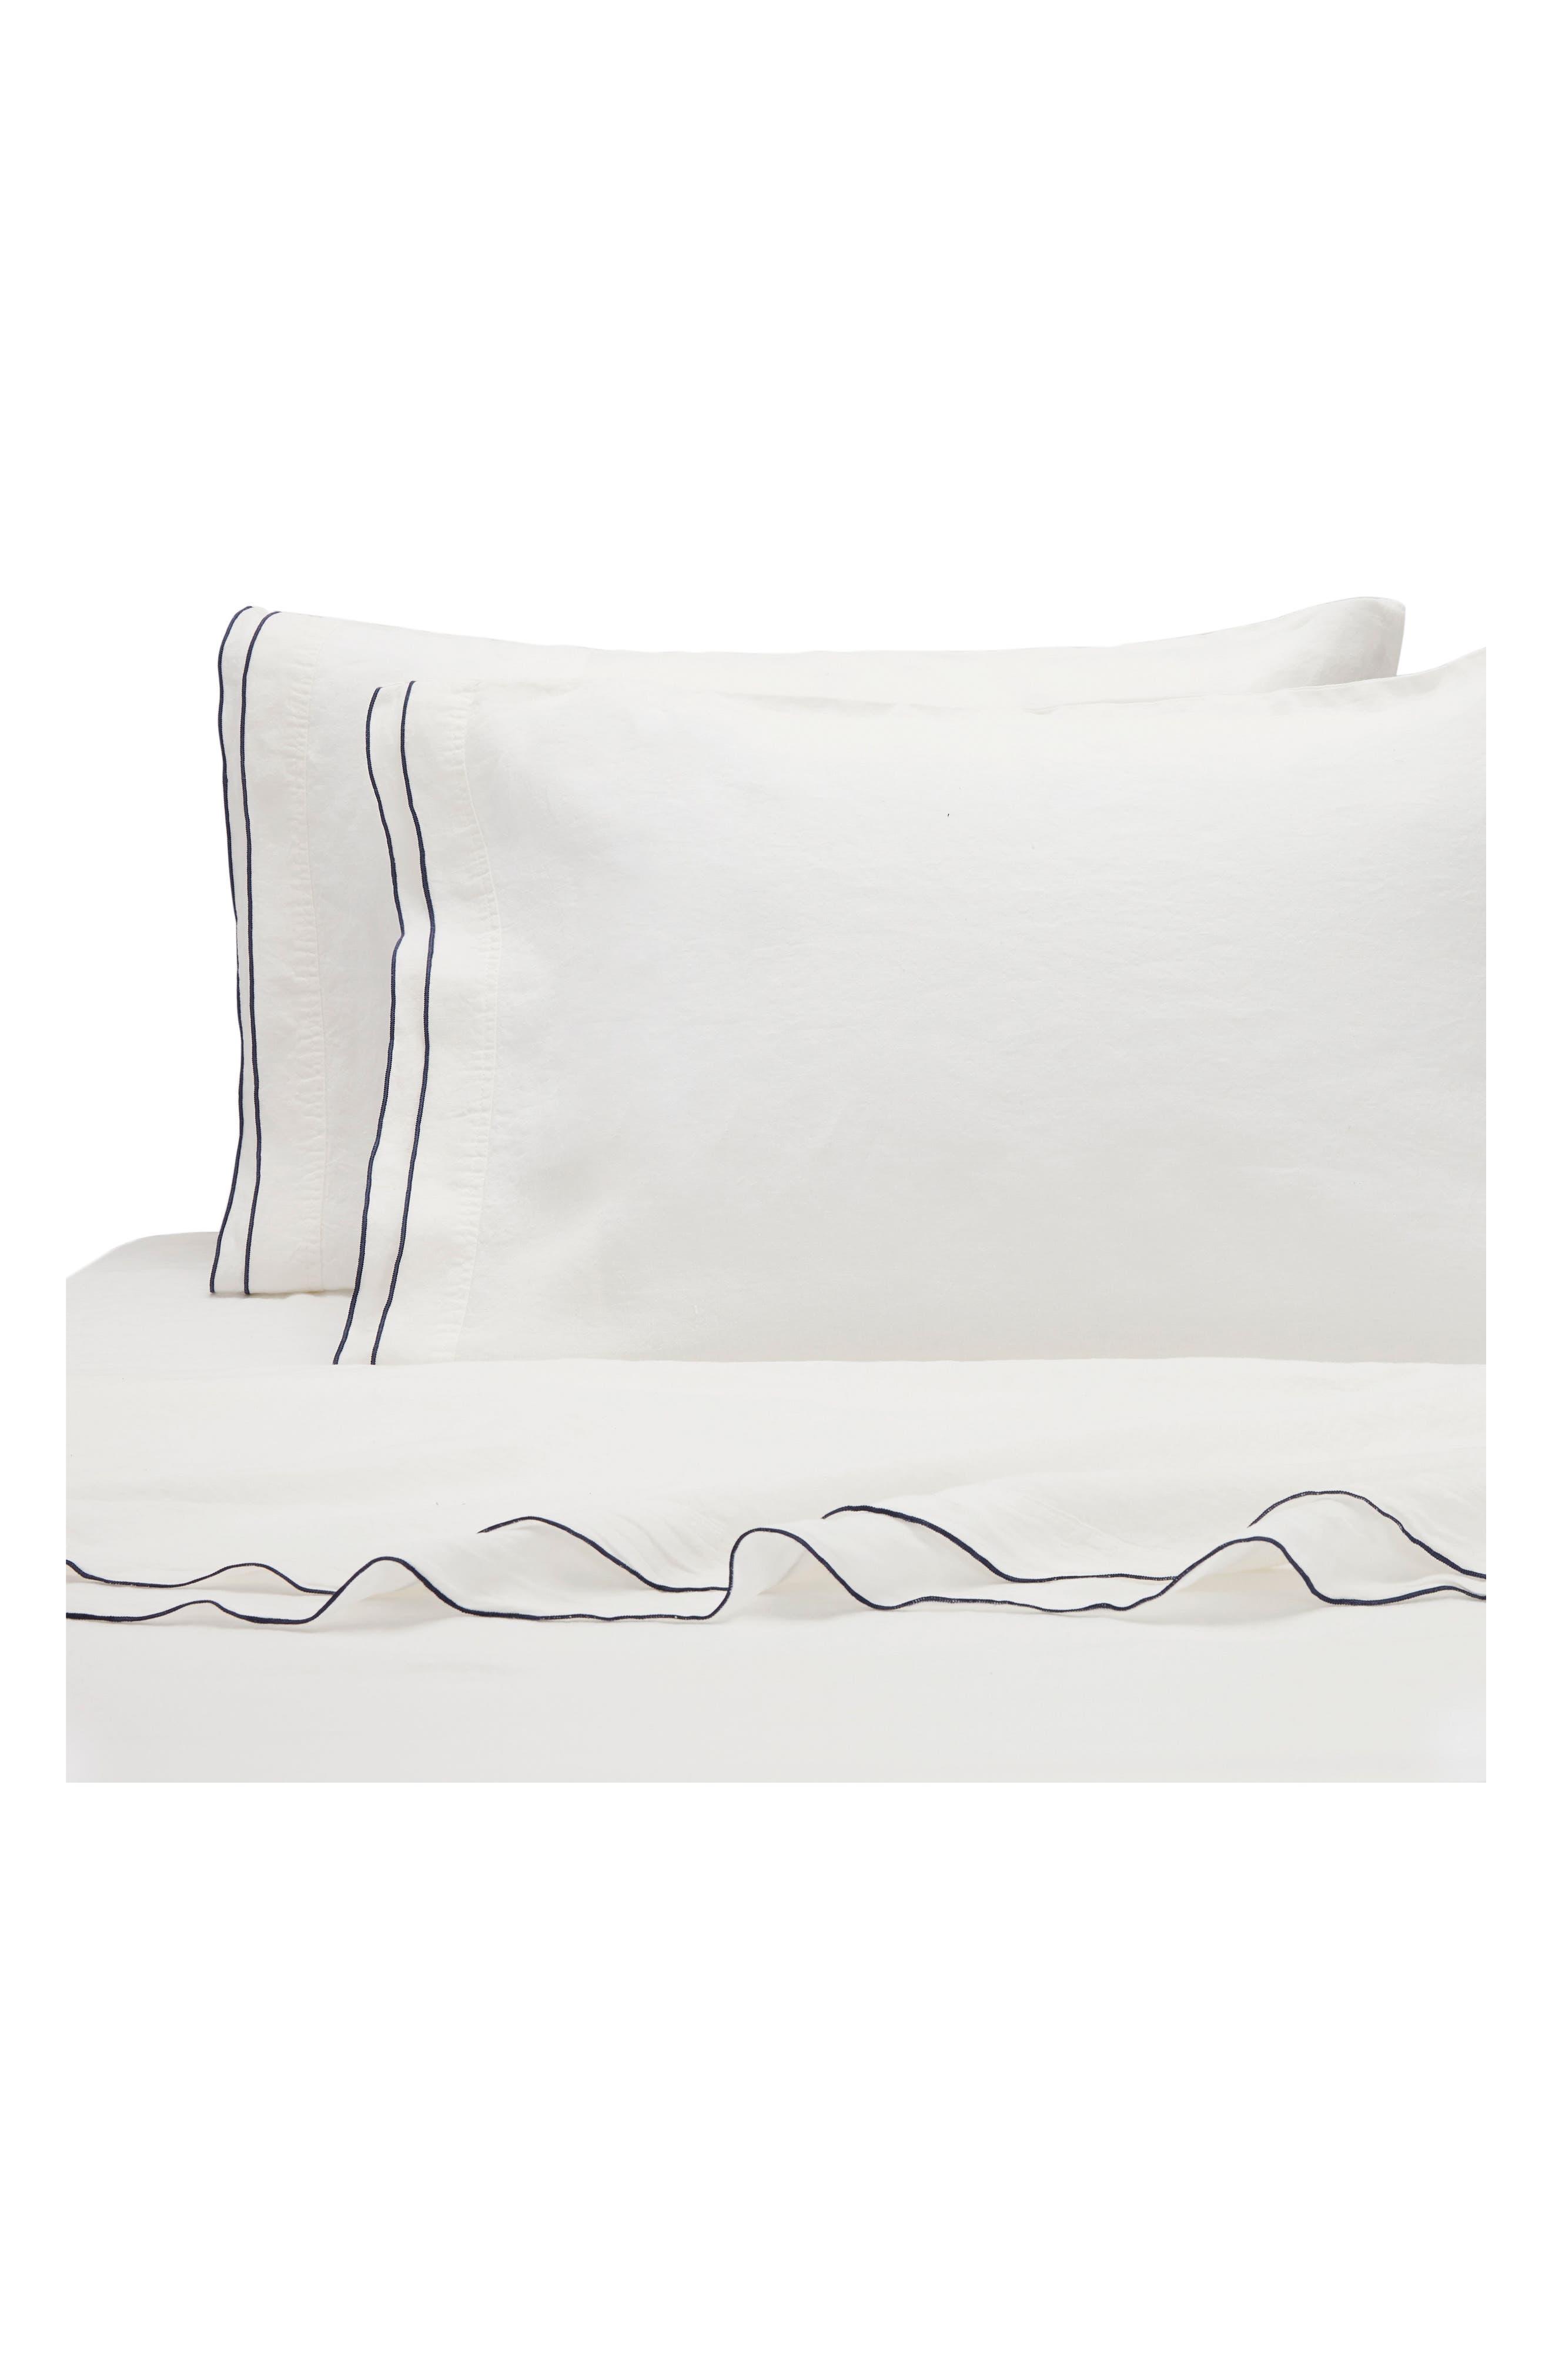 Biarritz Linen 300 Thread Count Pillowcase,                             Main thumbnail 1, color,                             White/ Indigo